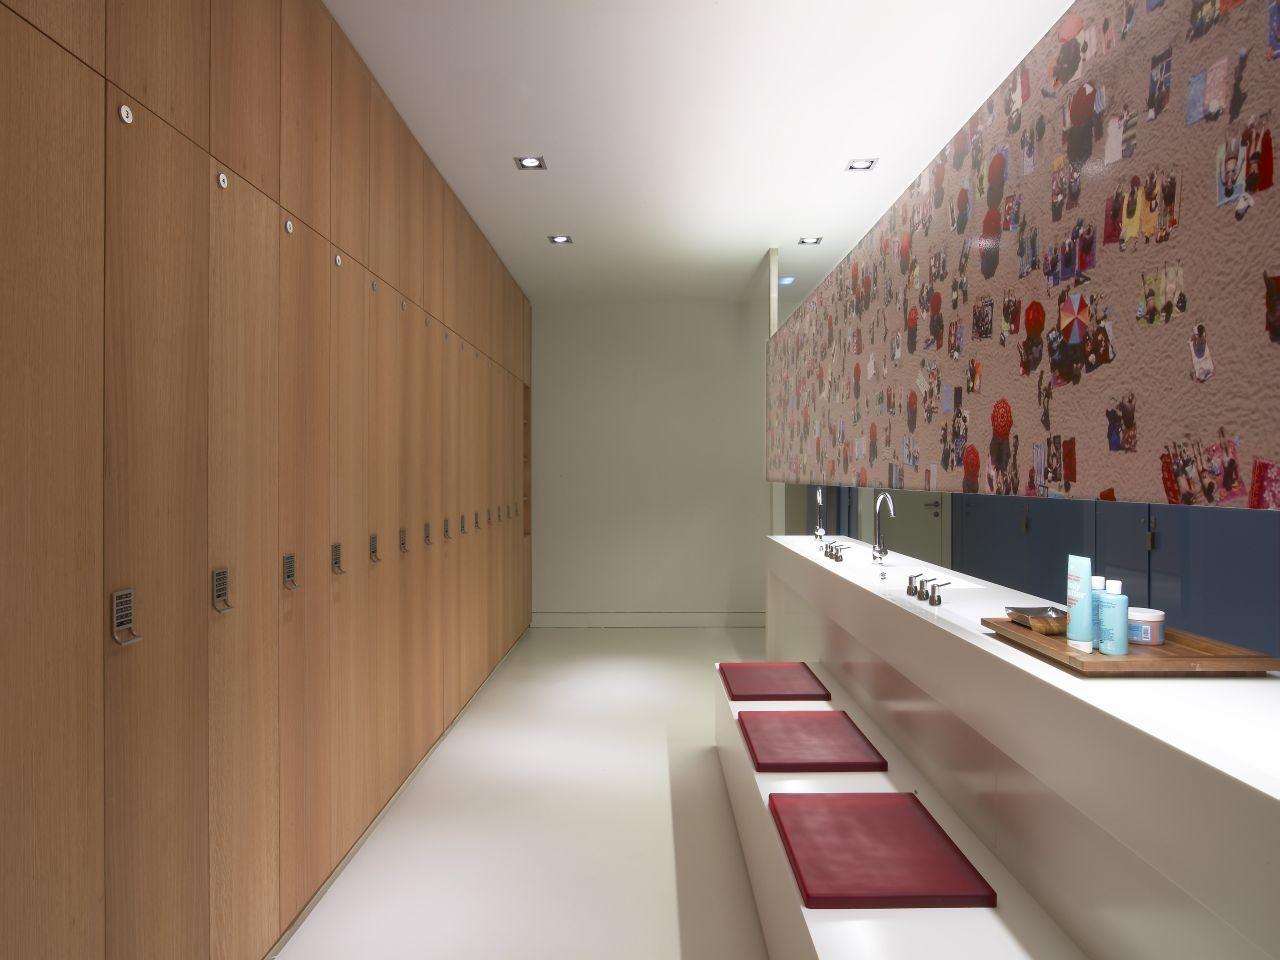 Gallery of w barcelona hotel ricardo bofill 19 for W hotel barcelona spa